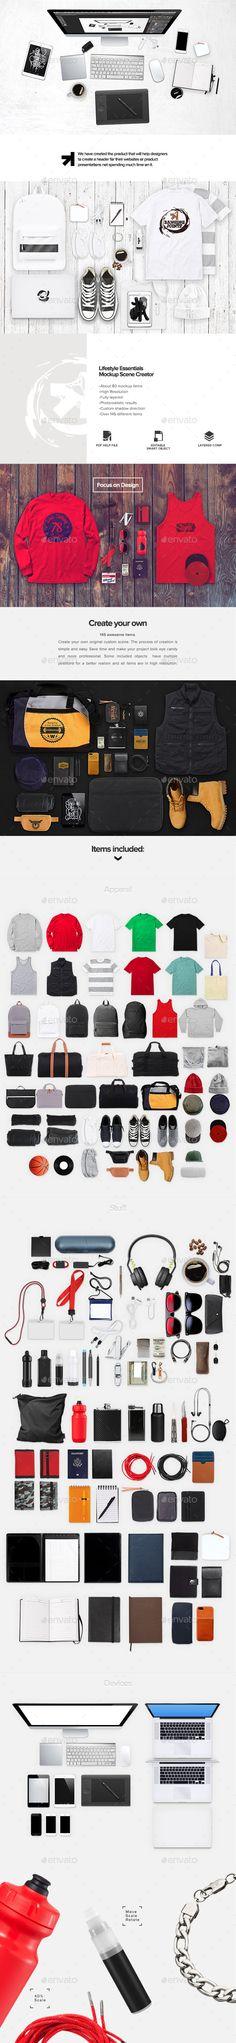 Apparel Lifestyle Essentials Mockup Creator #design Download: http://graphicriver.net/item/apparel-lifestyle-essentials-mockup-creator/12125715?ref=ksioks